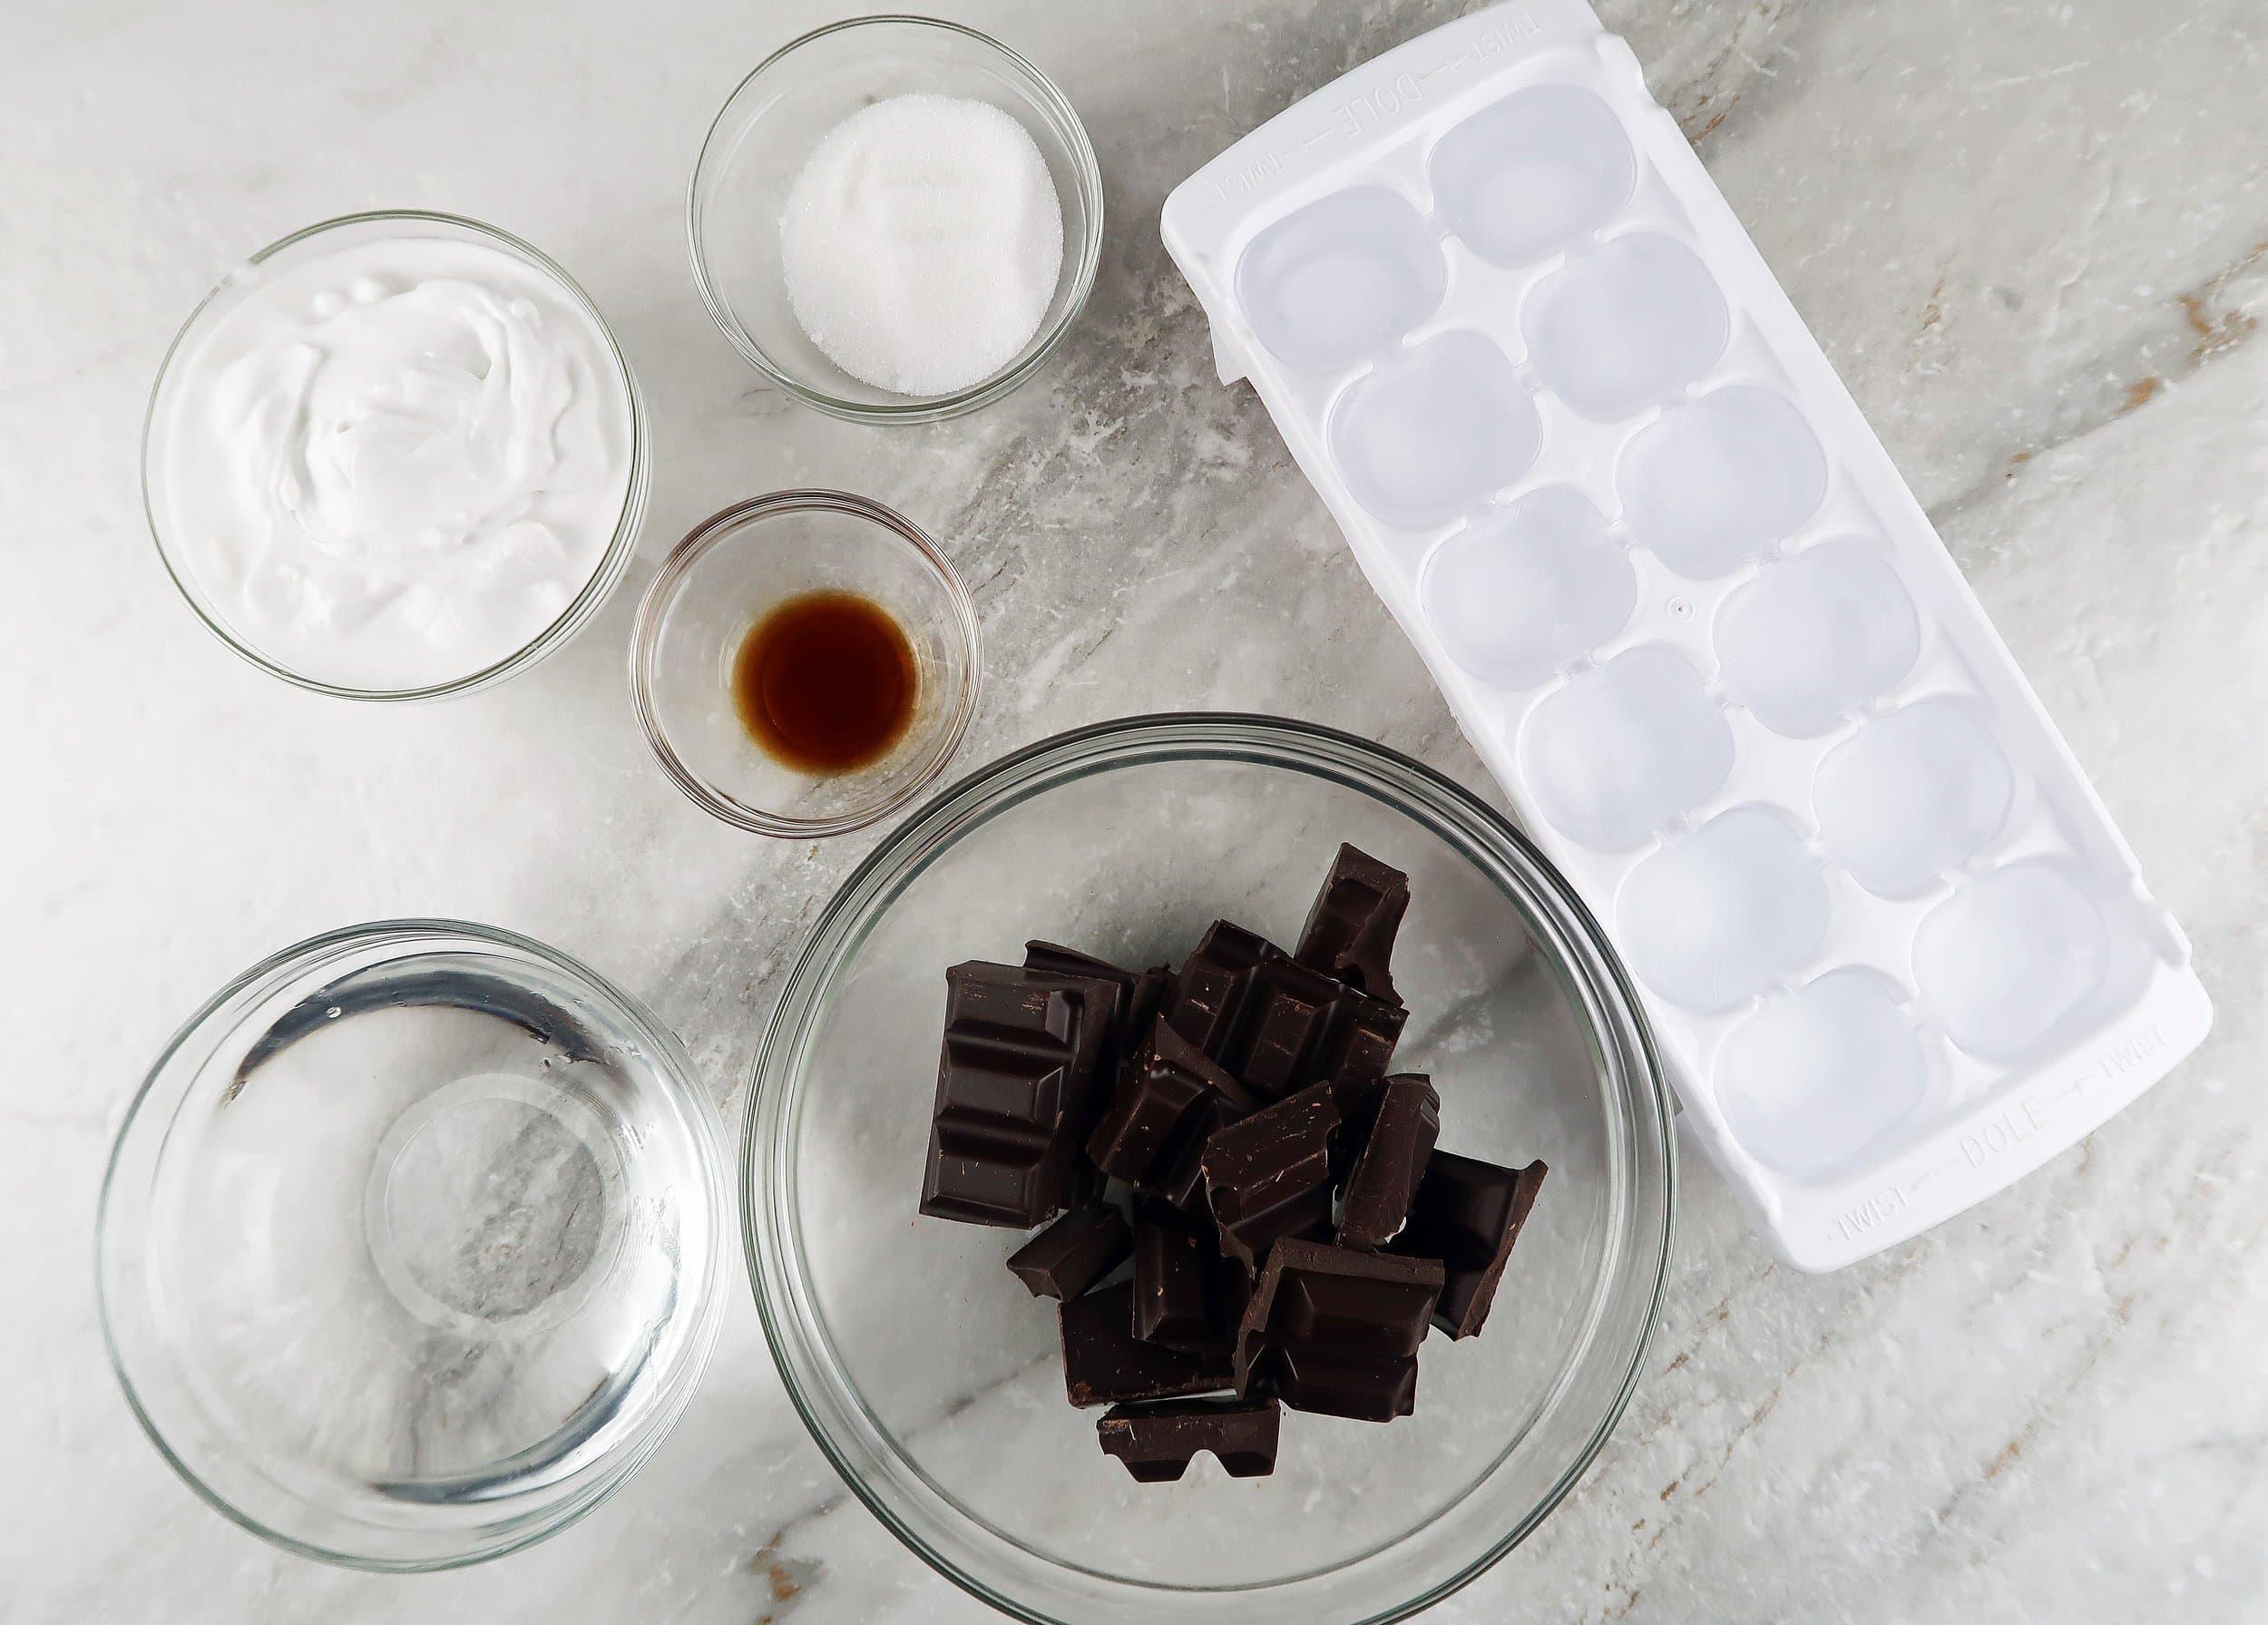 Dark chocolate, ice cube, coconut, whipping cream, and vanilla.